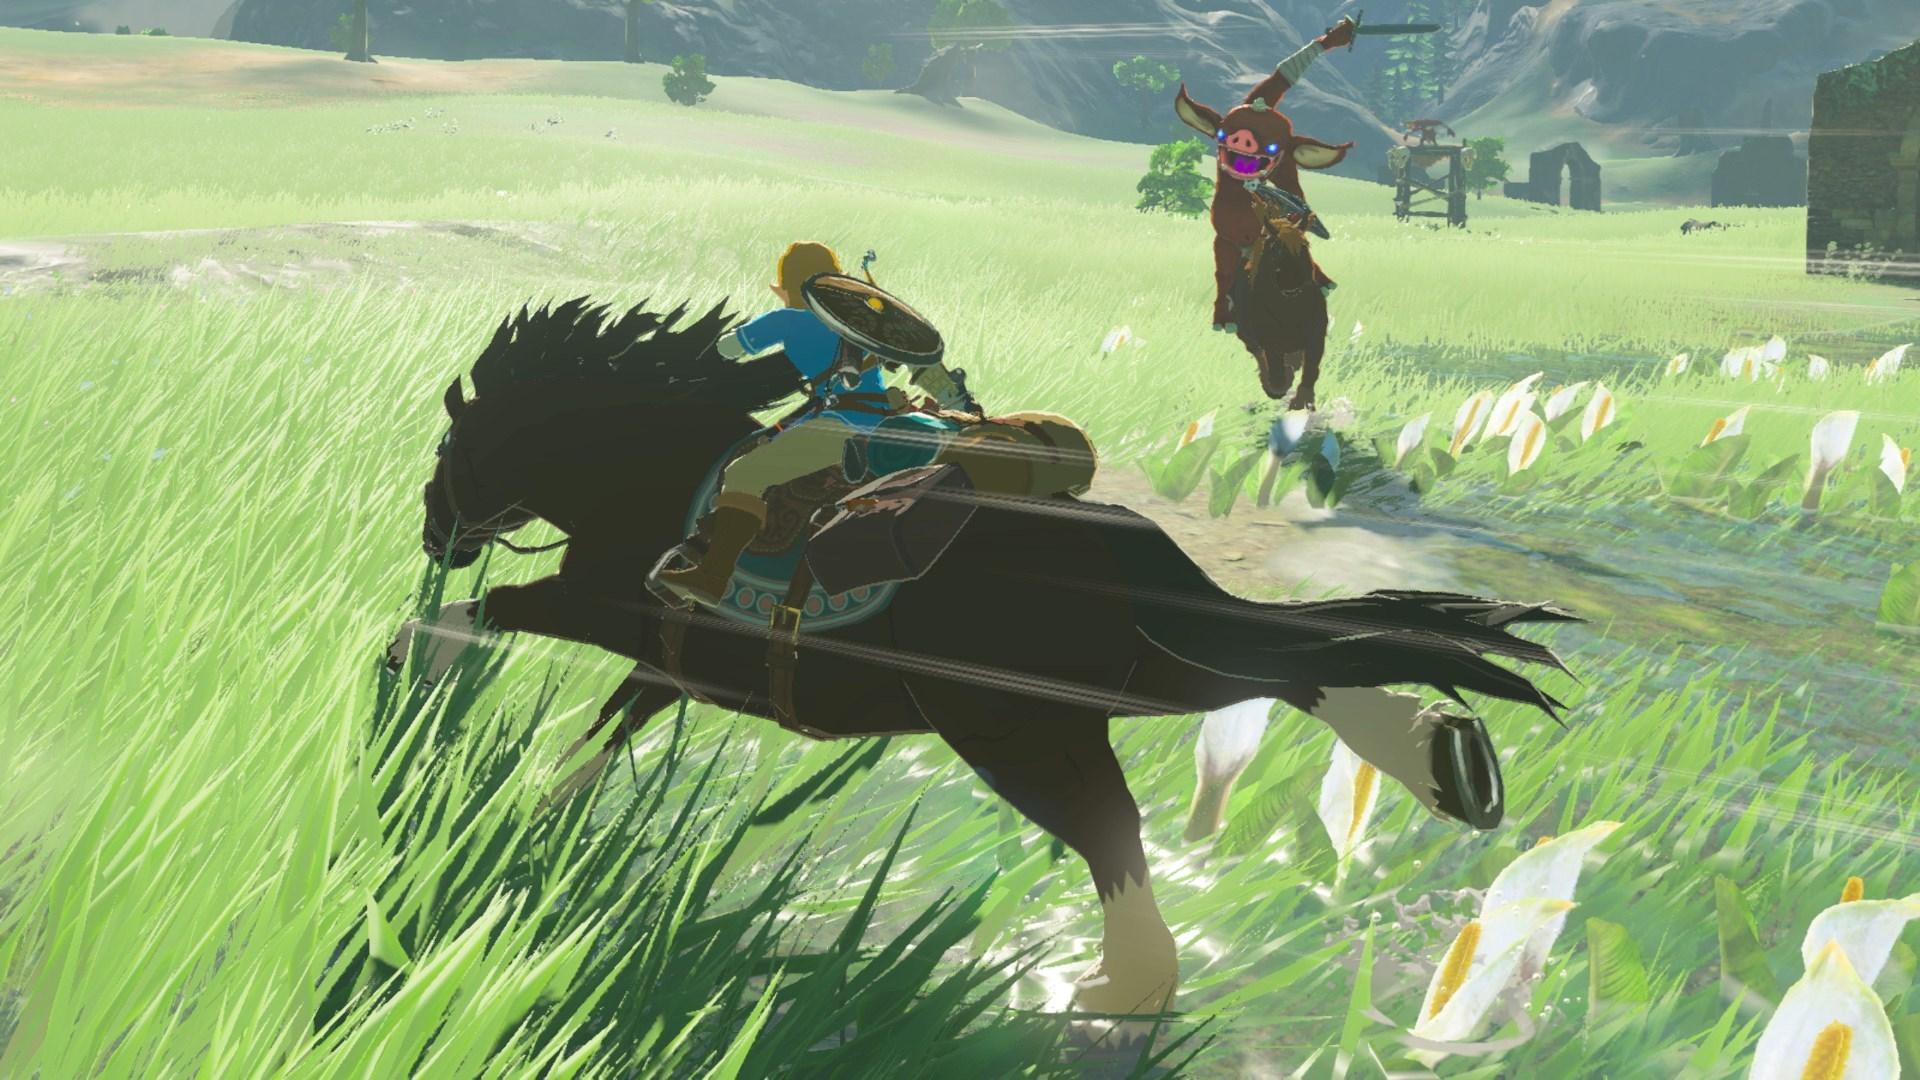 The LEgend of Zelda Breath of the Wild GOTY